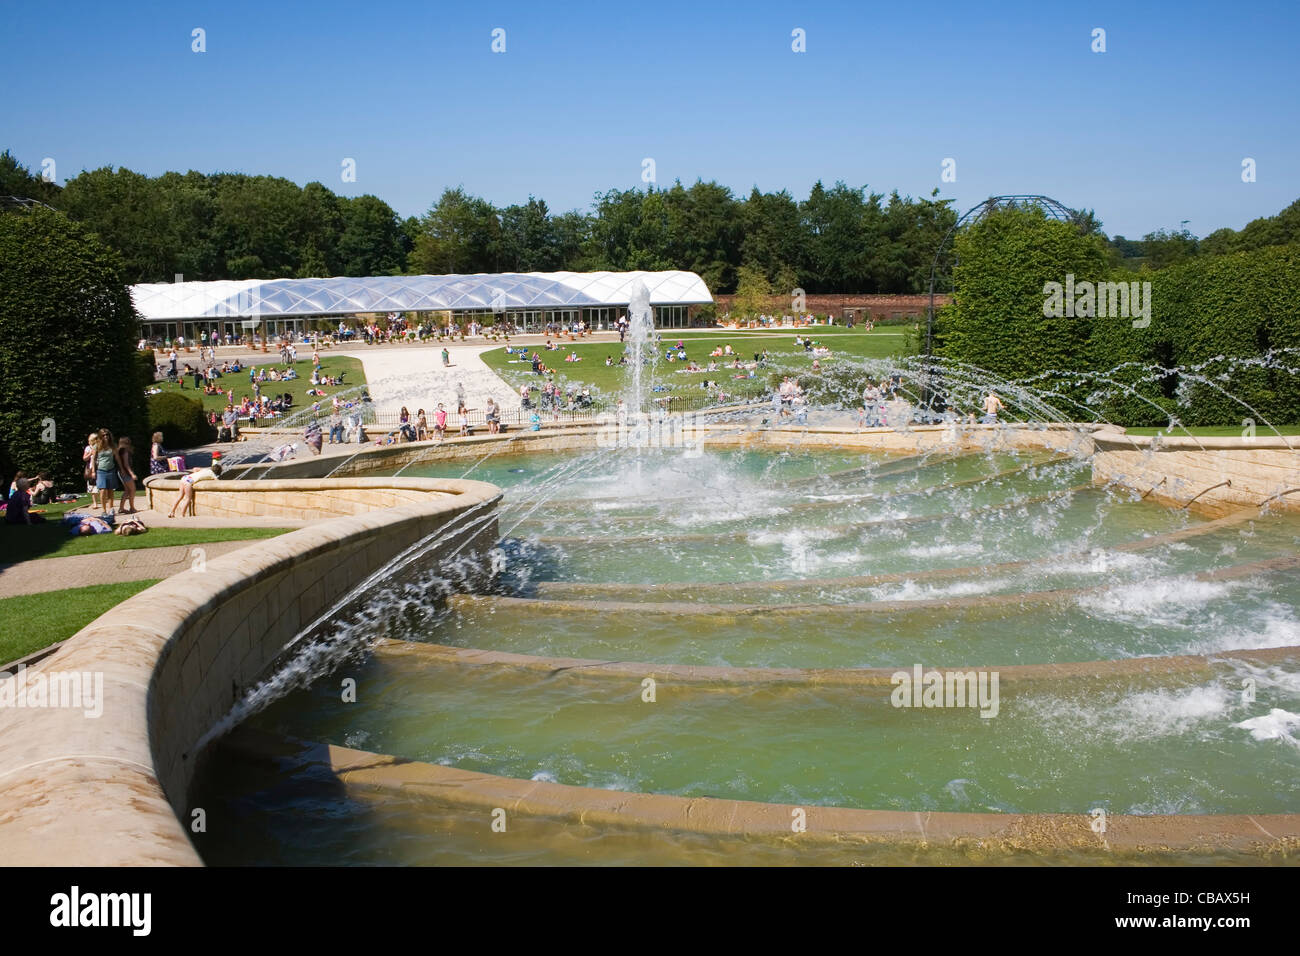 The Cascade fountain at The Alnwick Garden, Alnwick, Northumberland, England. - Stock Image